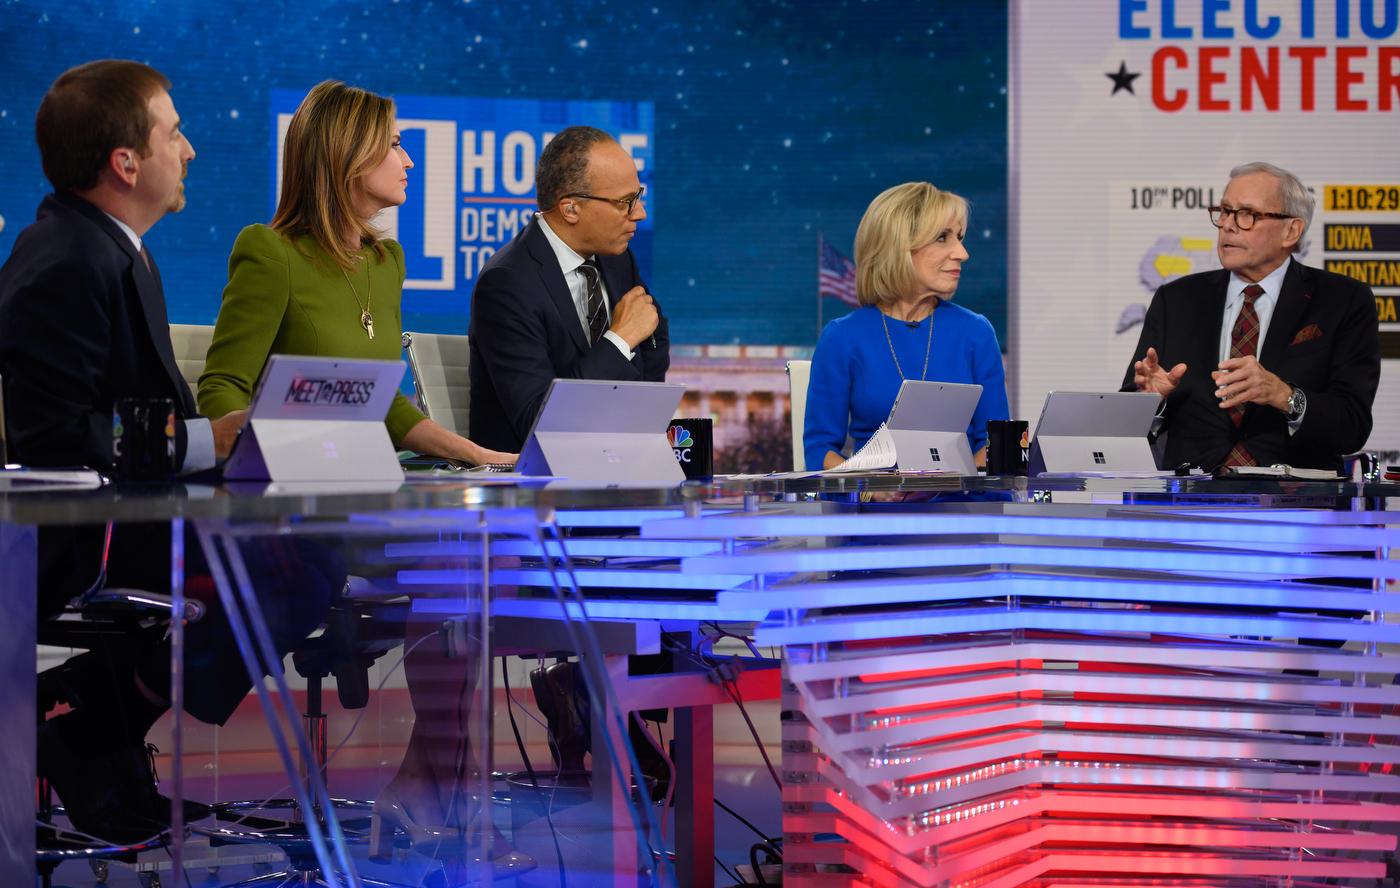 NCS_MSNBC-NBC-News-Election-Studio_0005